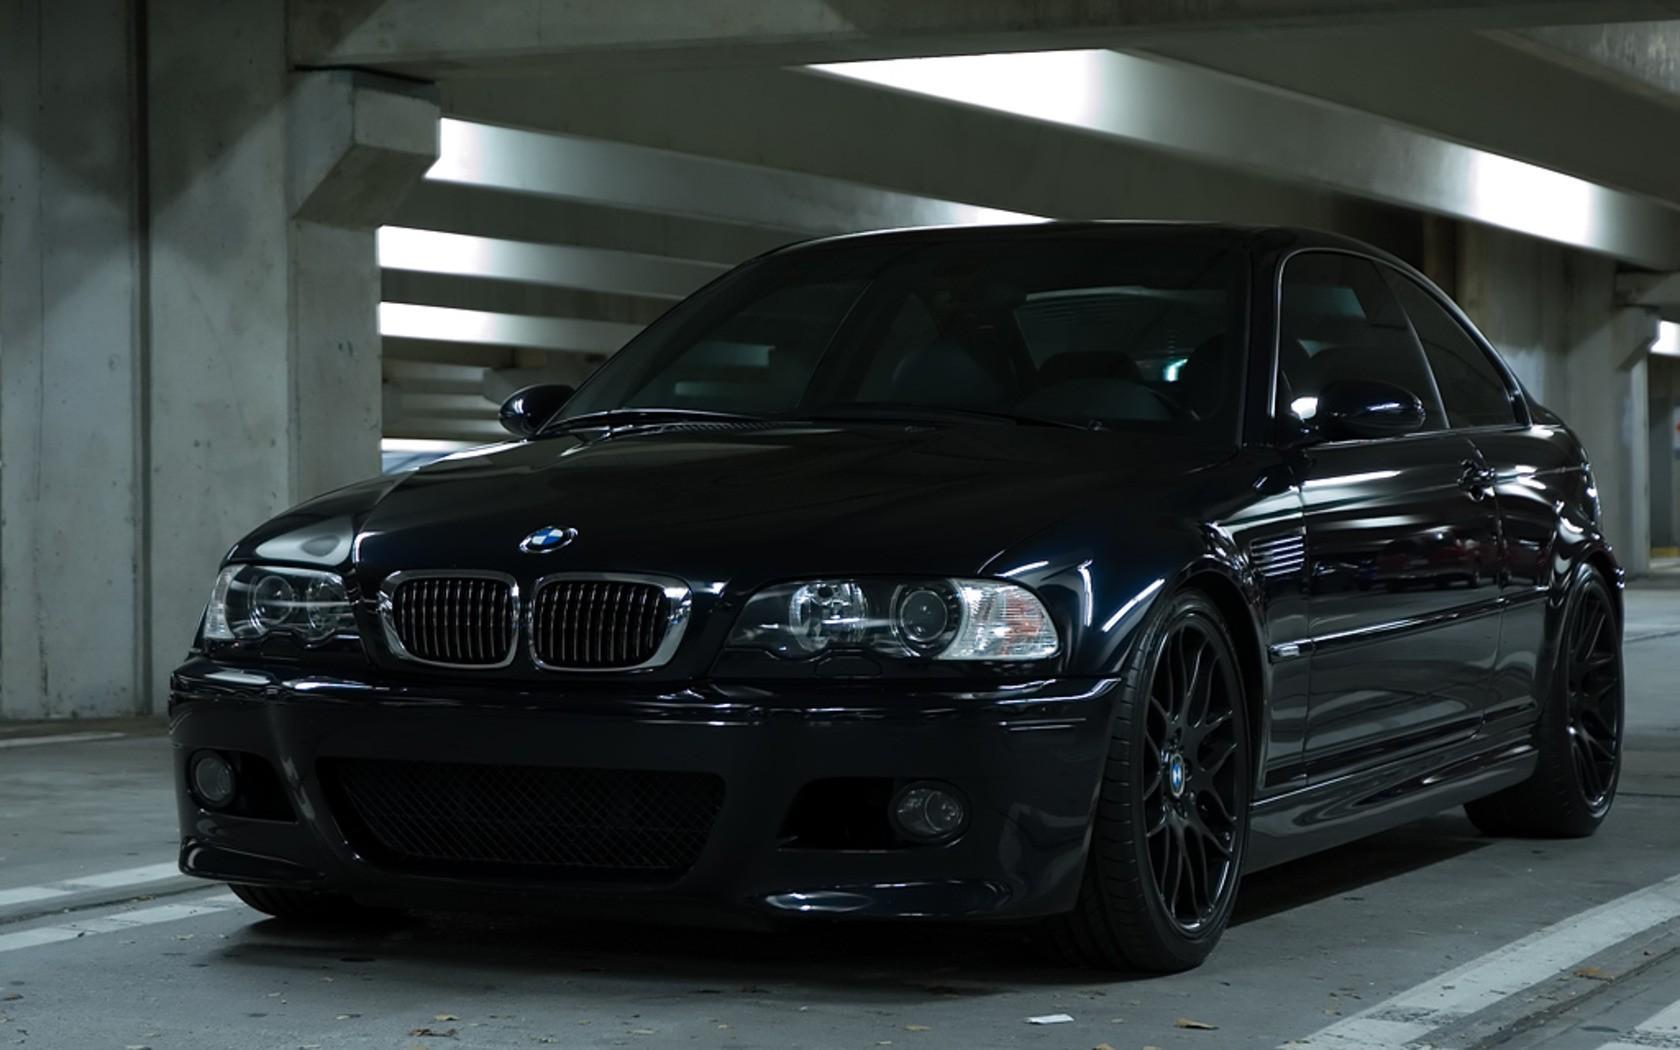 Bmw Black Cars Vehicle Car Bmw E46 Bmw 3 Series 1680x1050 Wallpaper Wallhaven Cc